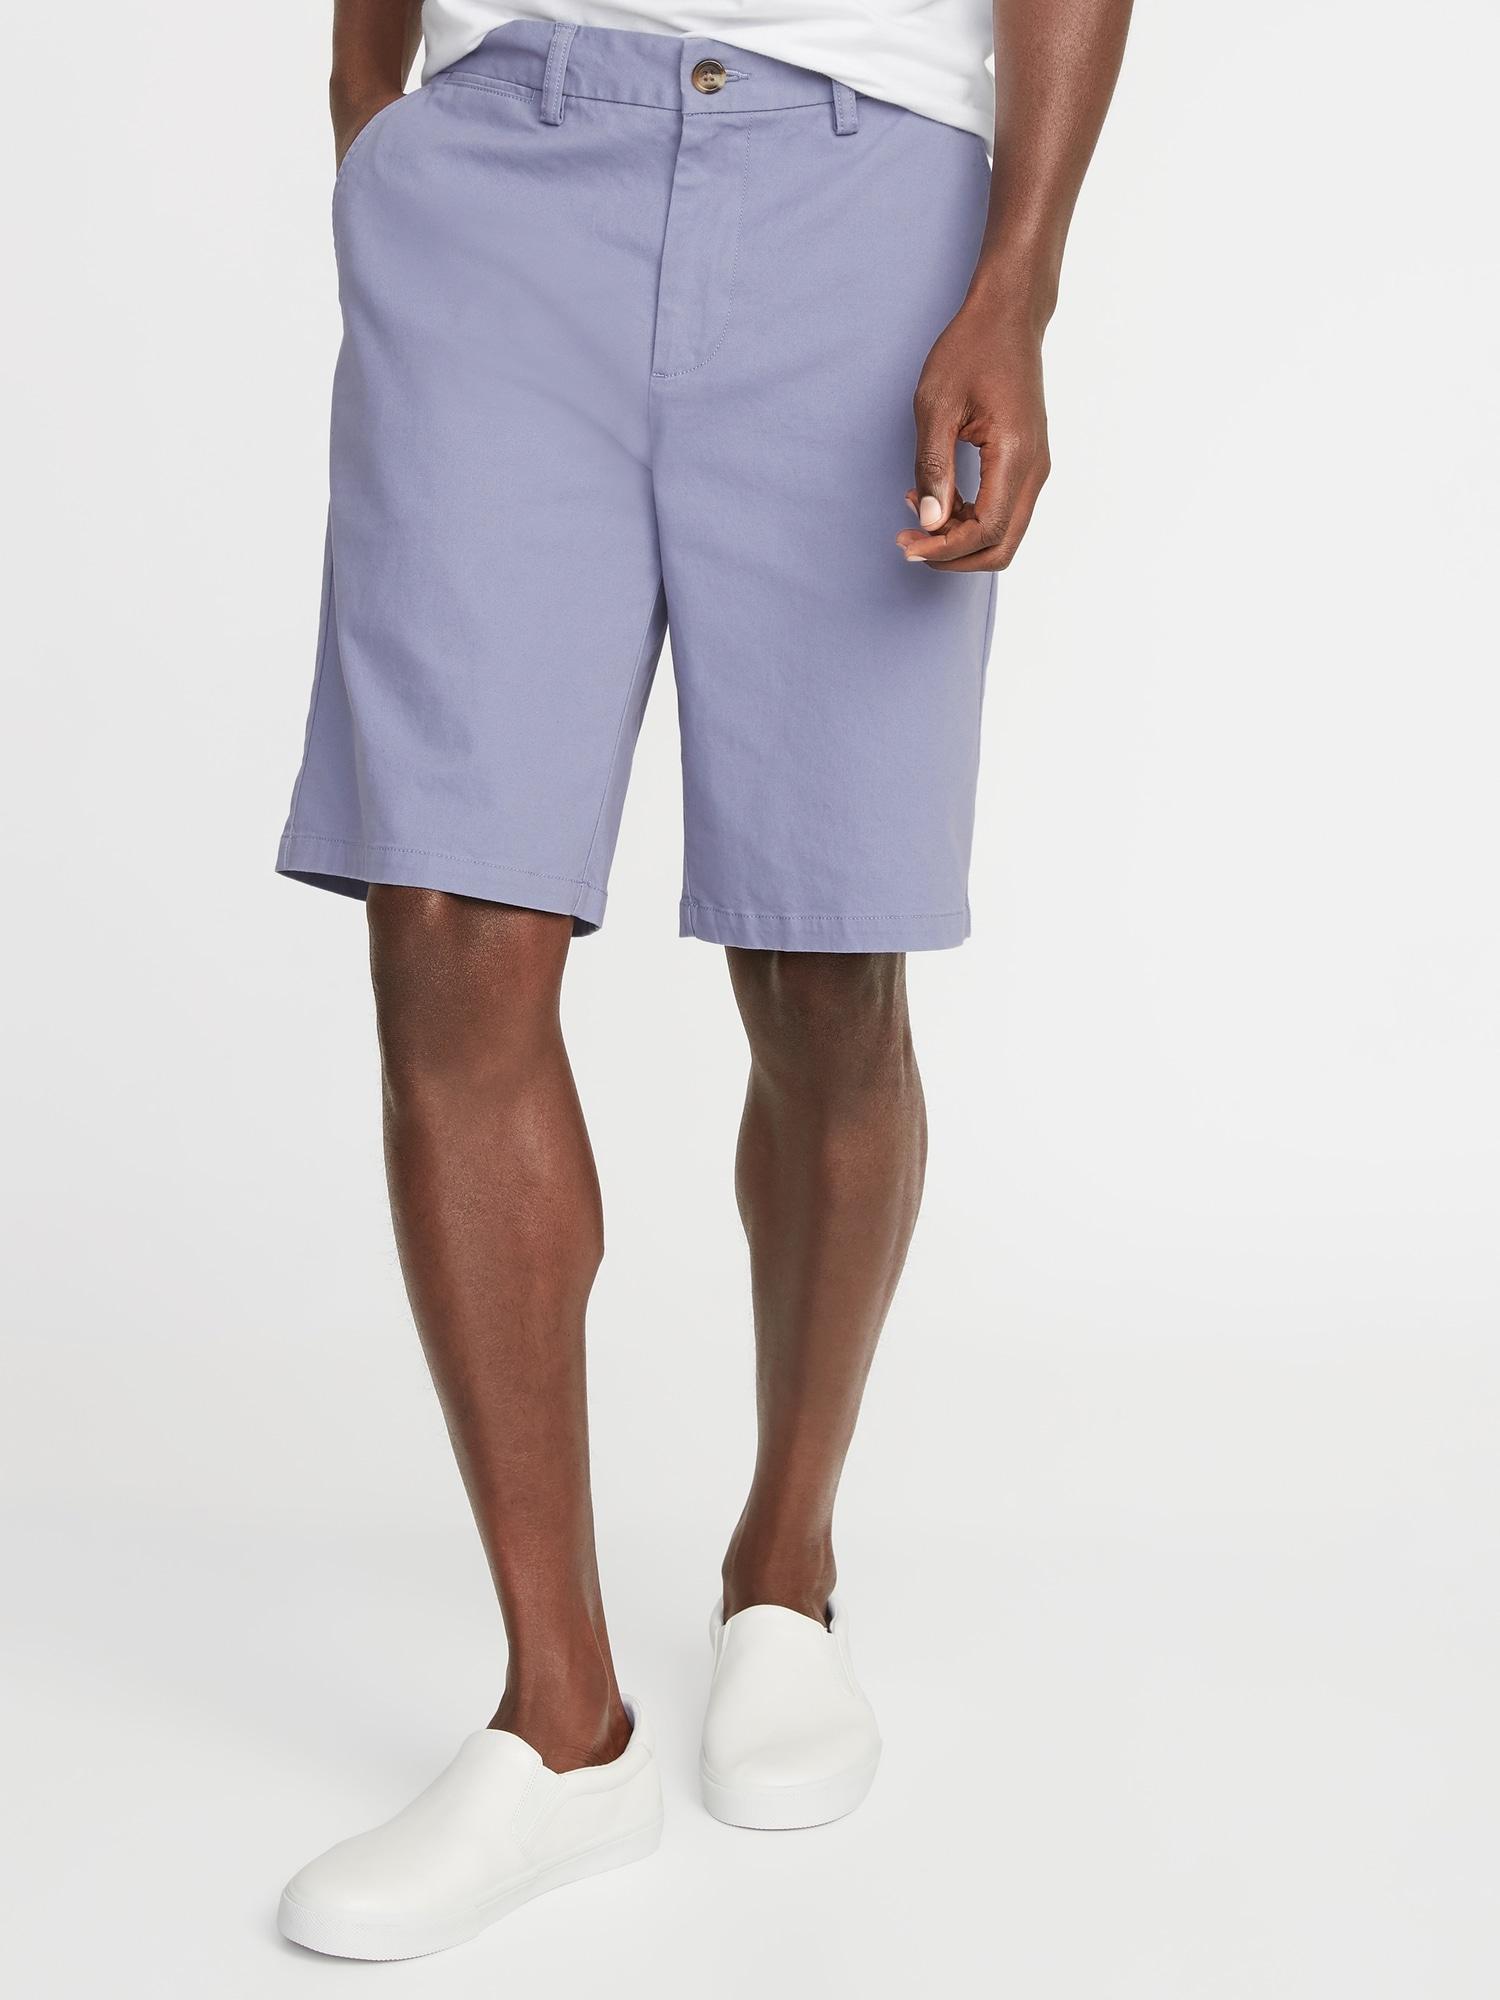 28600268c8a Slim Ultimate Built-In Flex Shorts for Men -10-inch inseam